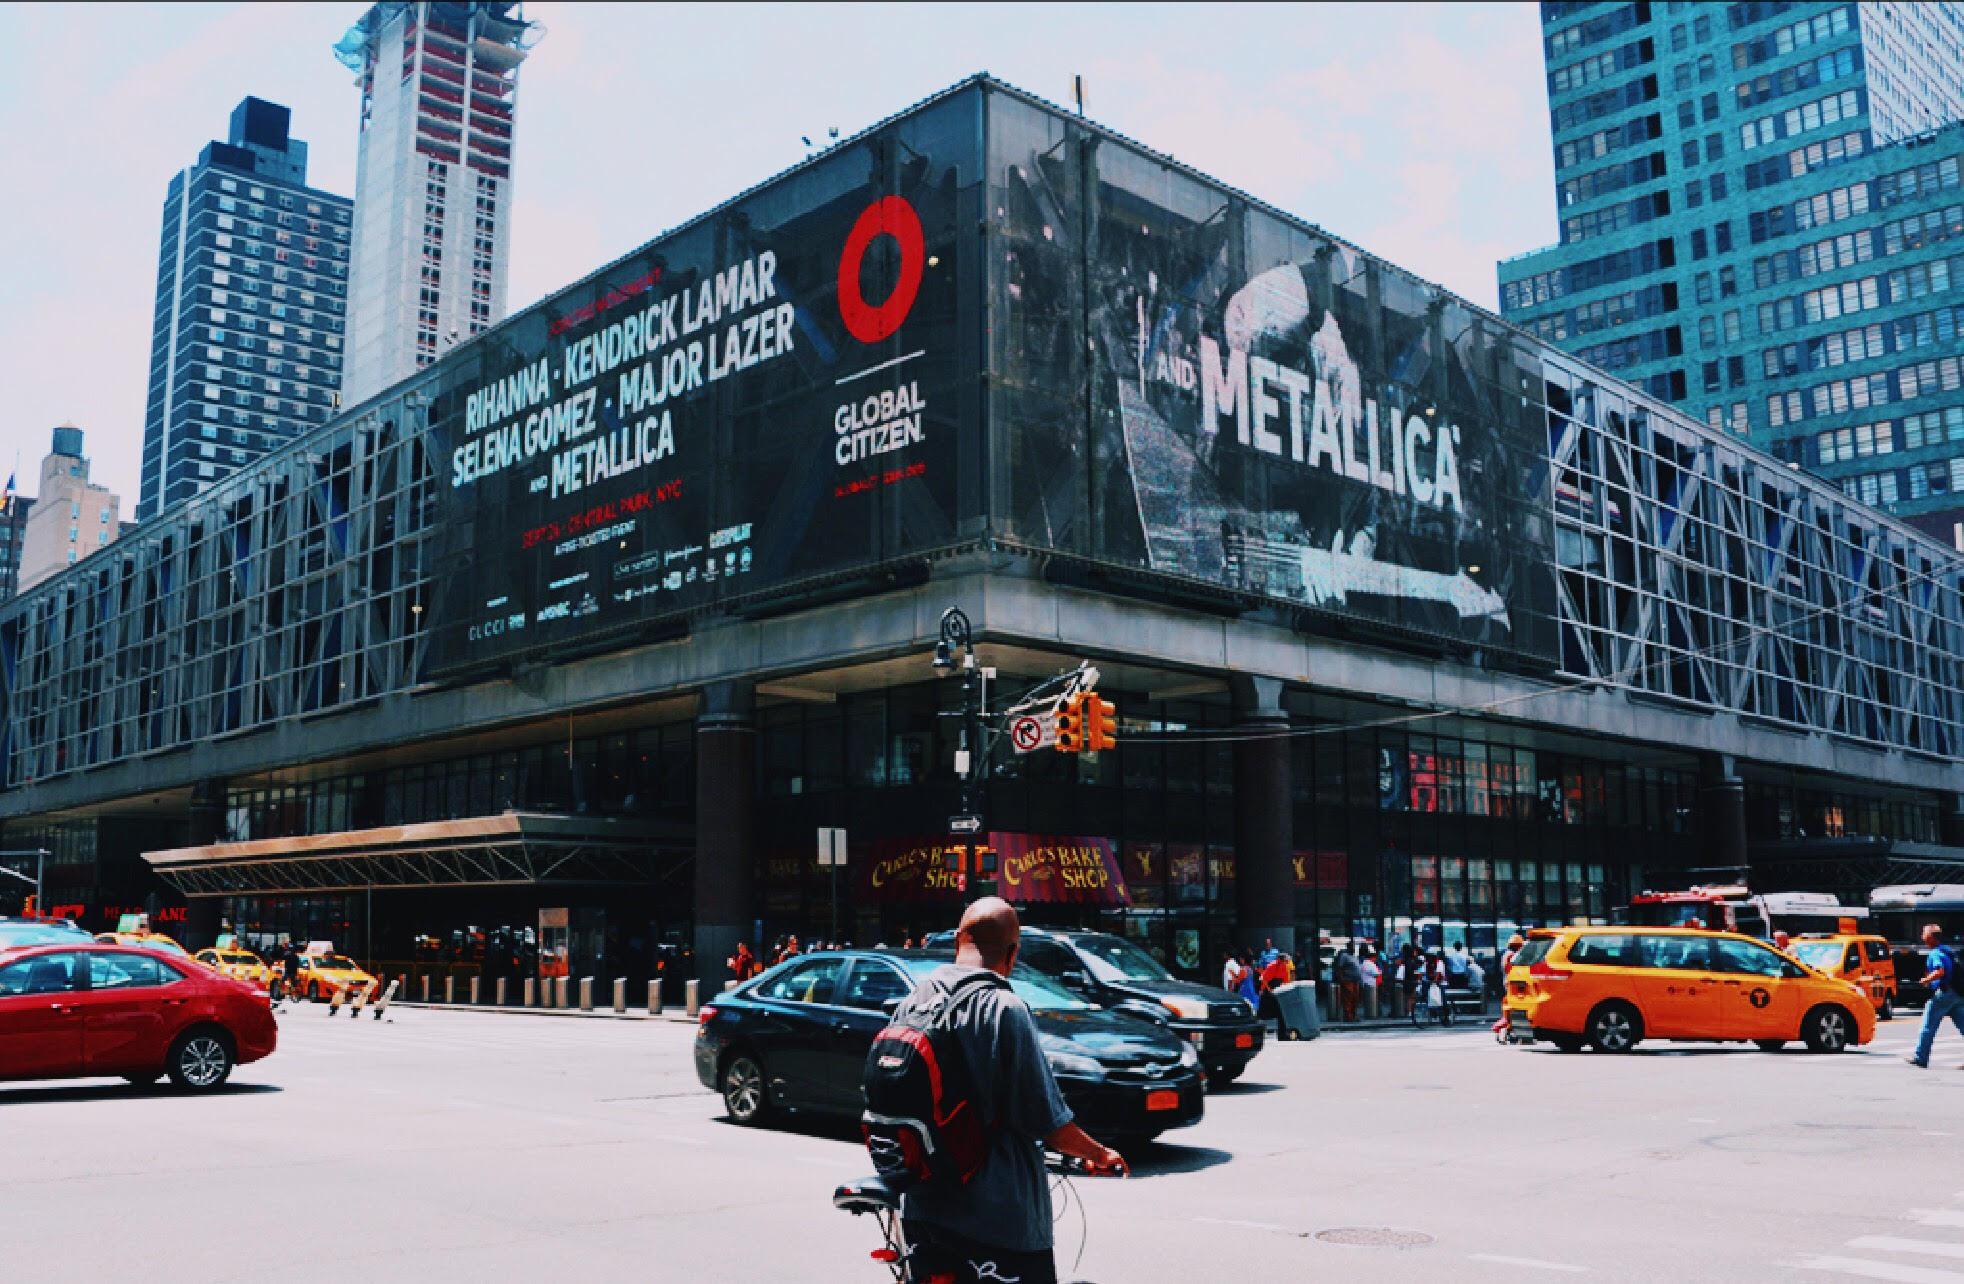 2016 Global Citizen Festival OOH campaign — Penn Station, New York City